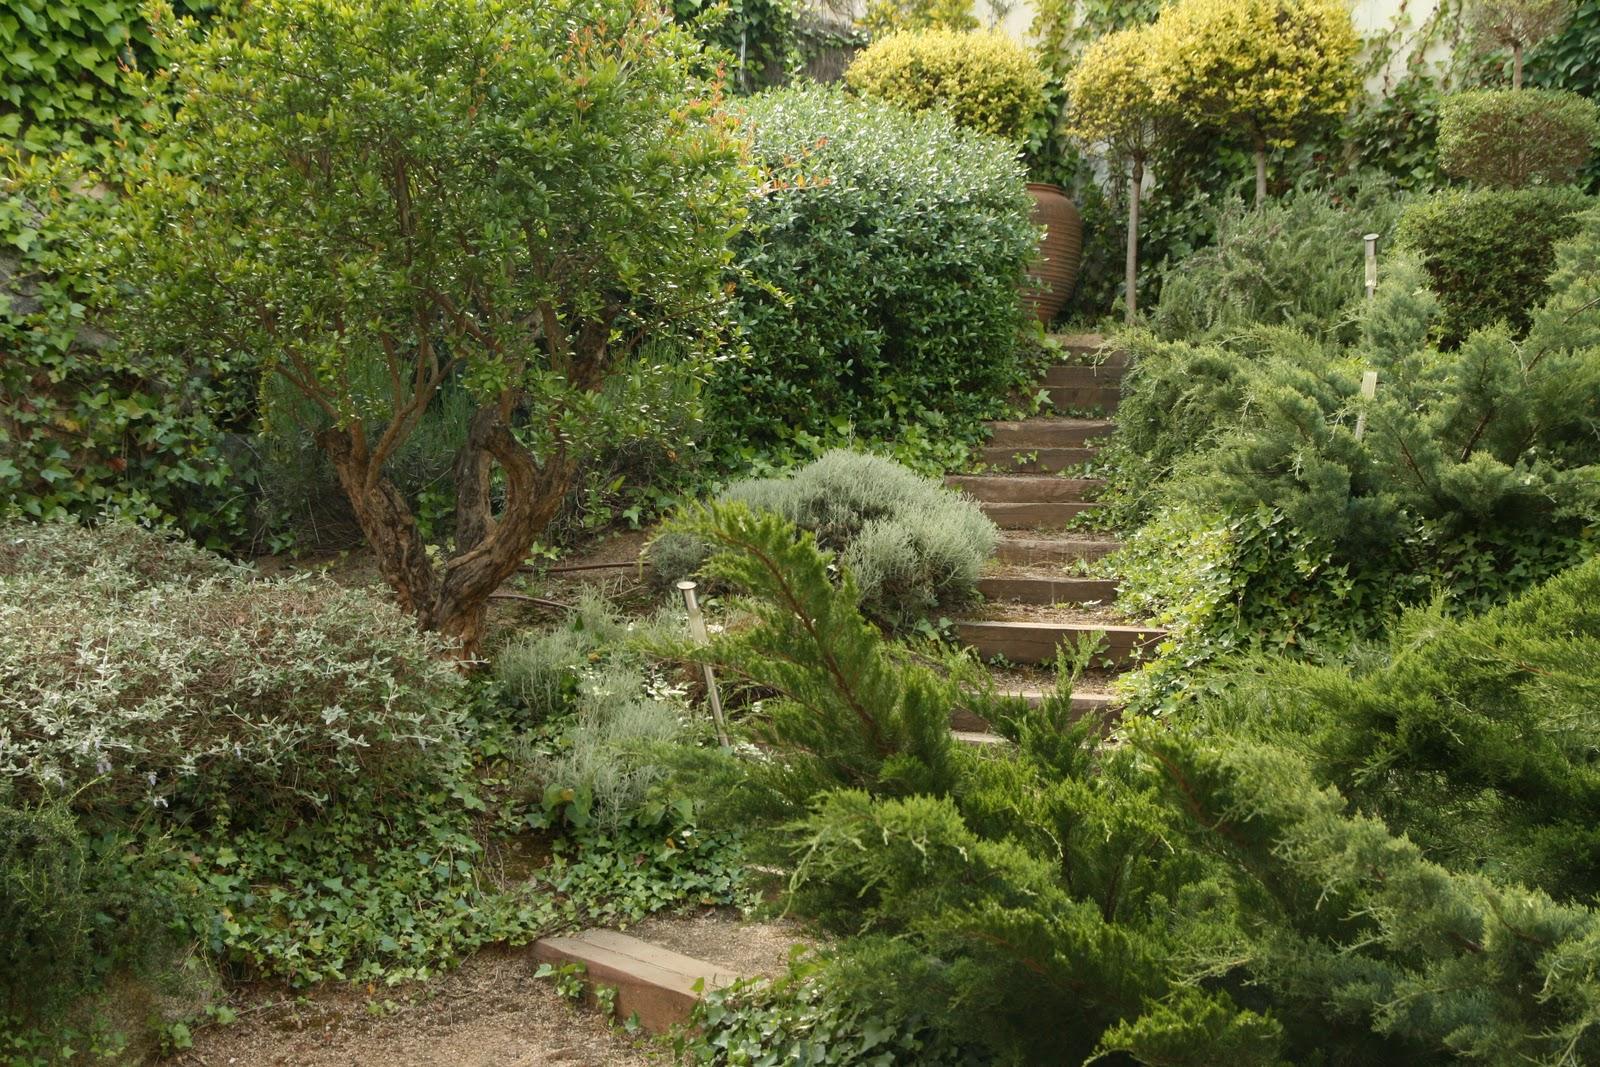 Jardinitis jard n con desniveles - Disenador de jardines ...